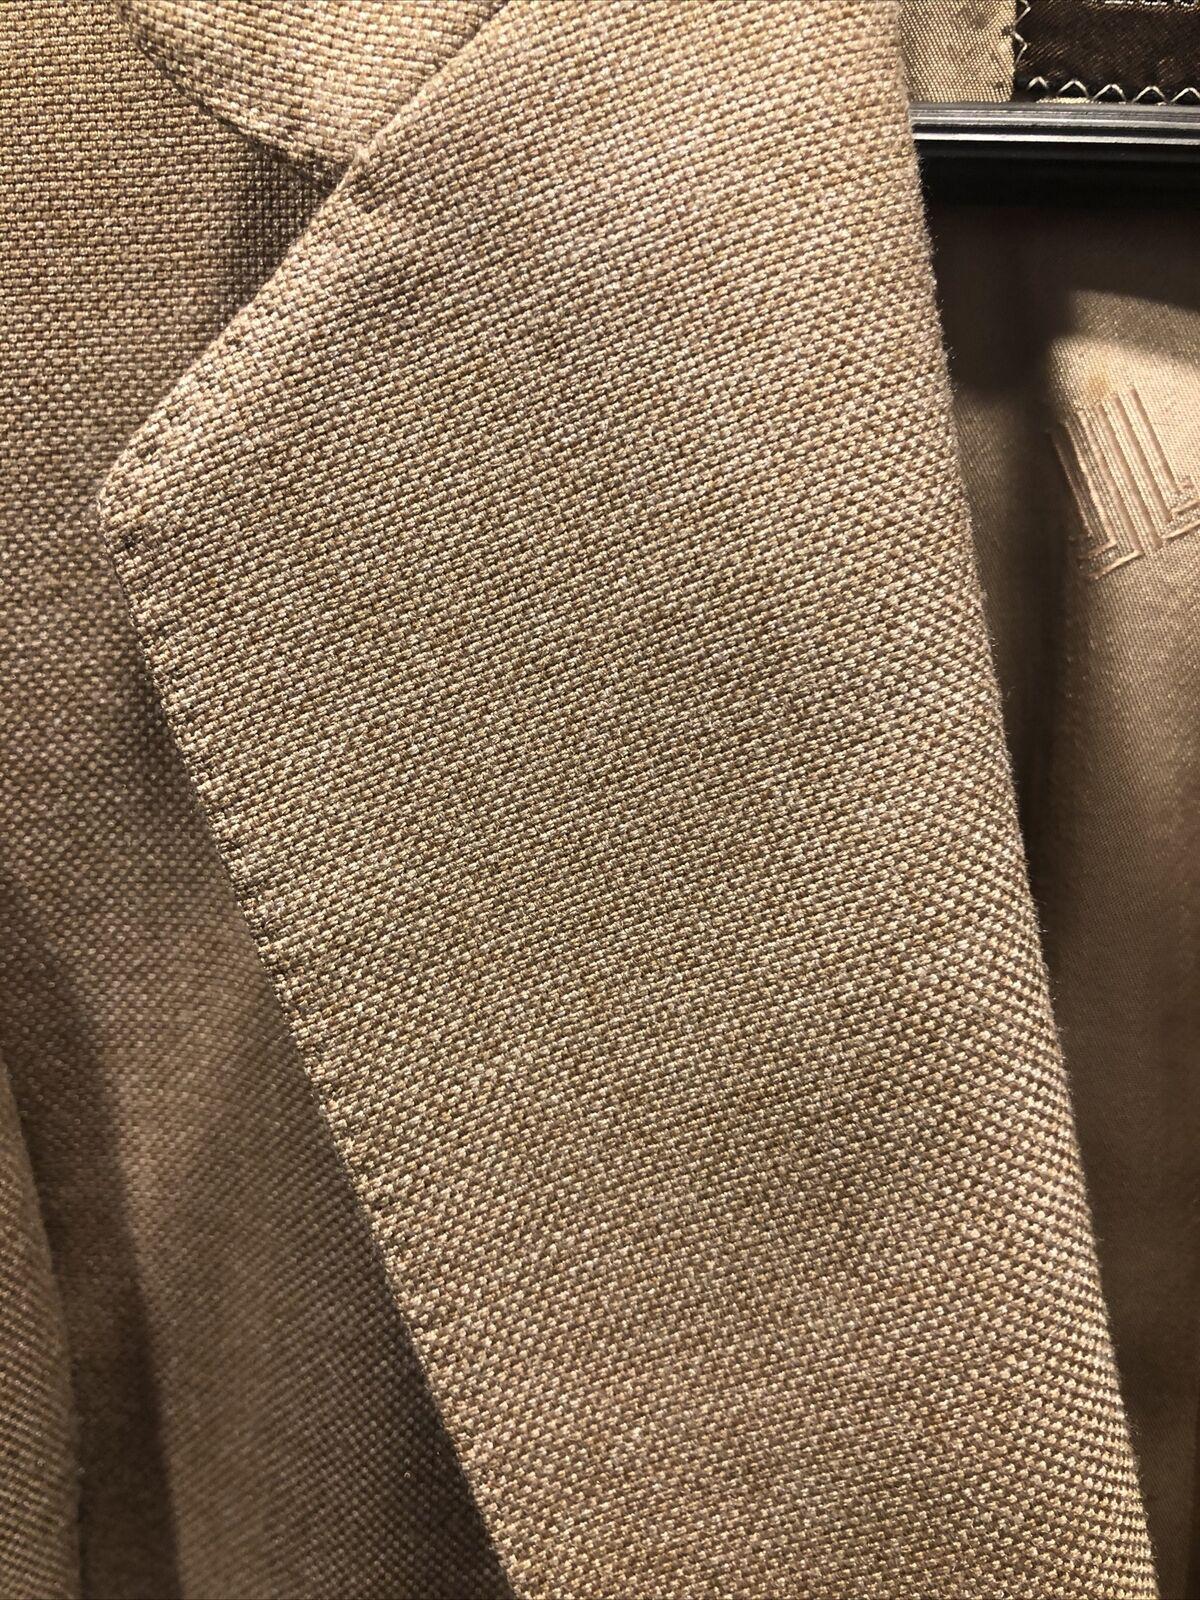 Vintage Lanvin Linen Blazer jacket Men's 42s  197… - image 12